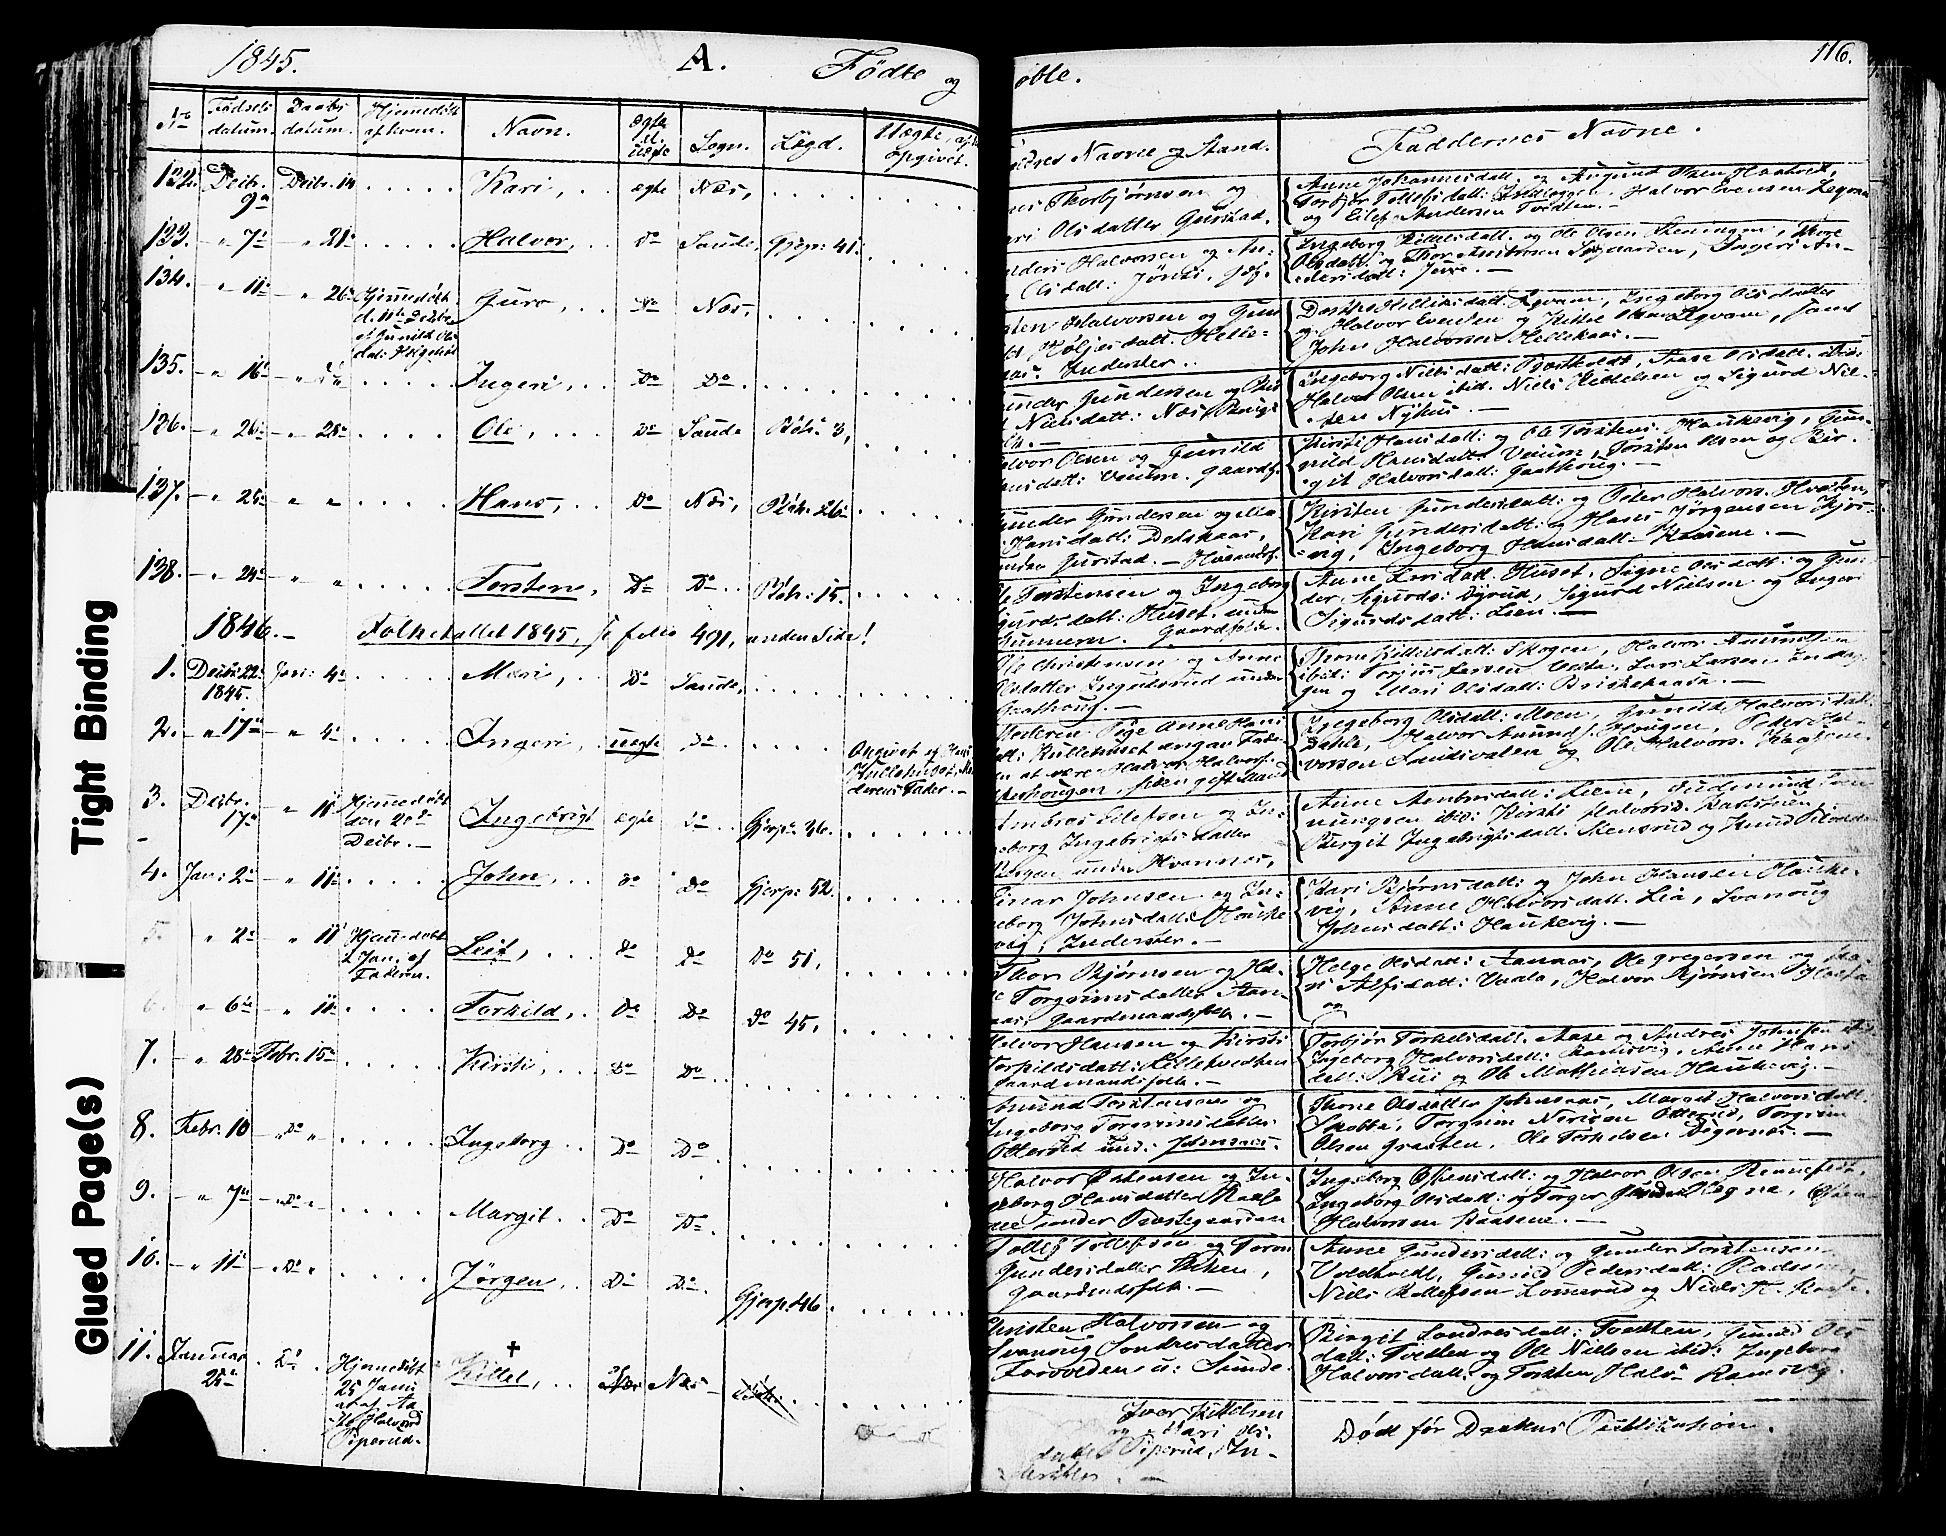 SAKO, Sauherad kirkebøker, F/Fa/L0006: Ministerialbok nr. I 6, 1827-1850, s. 116